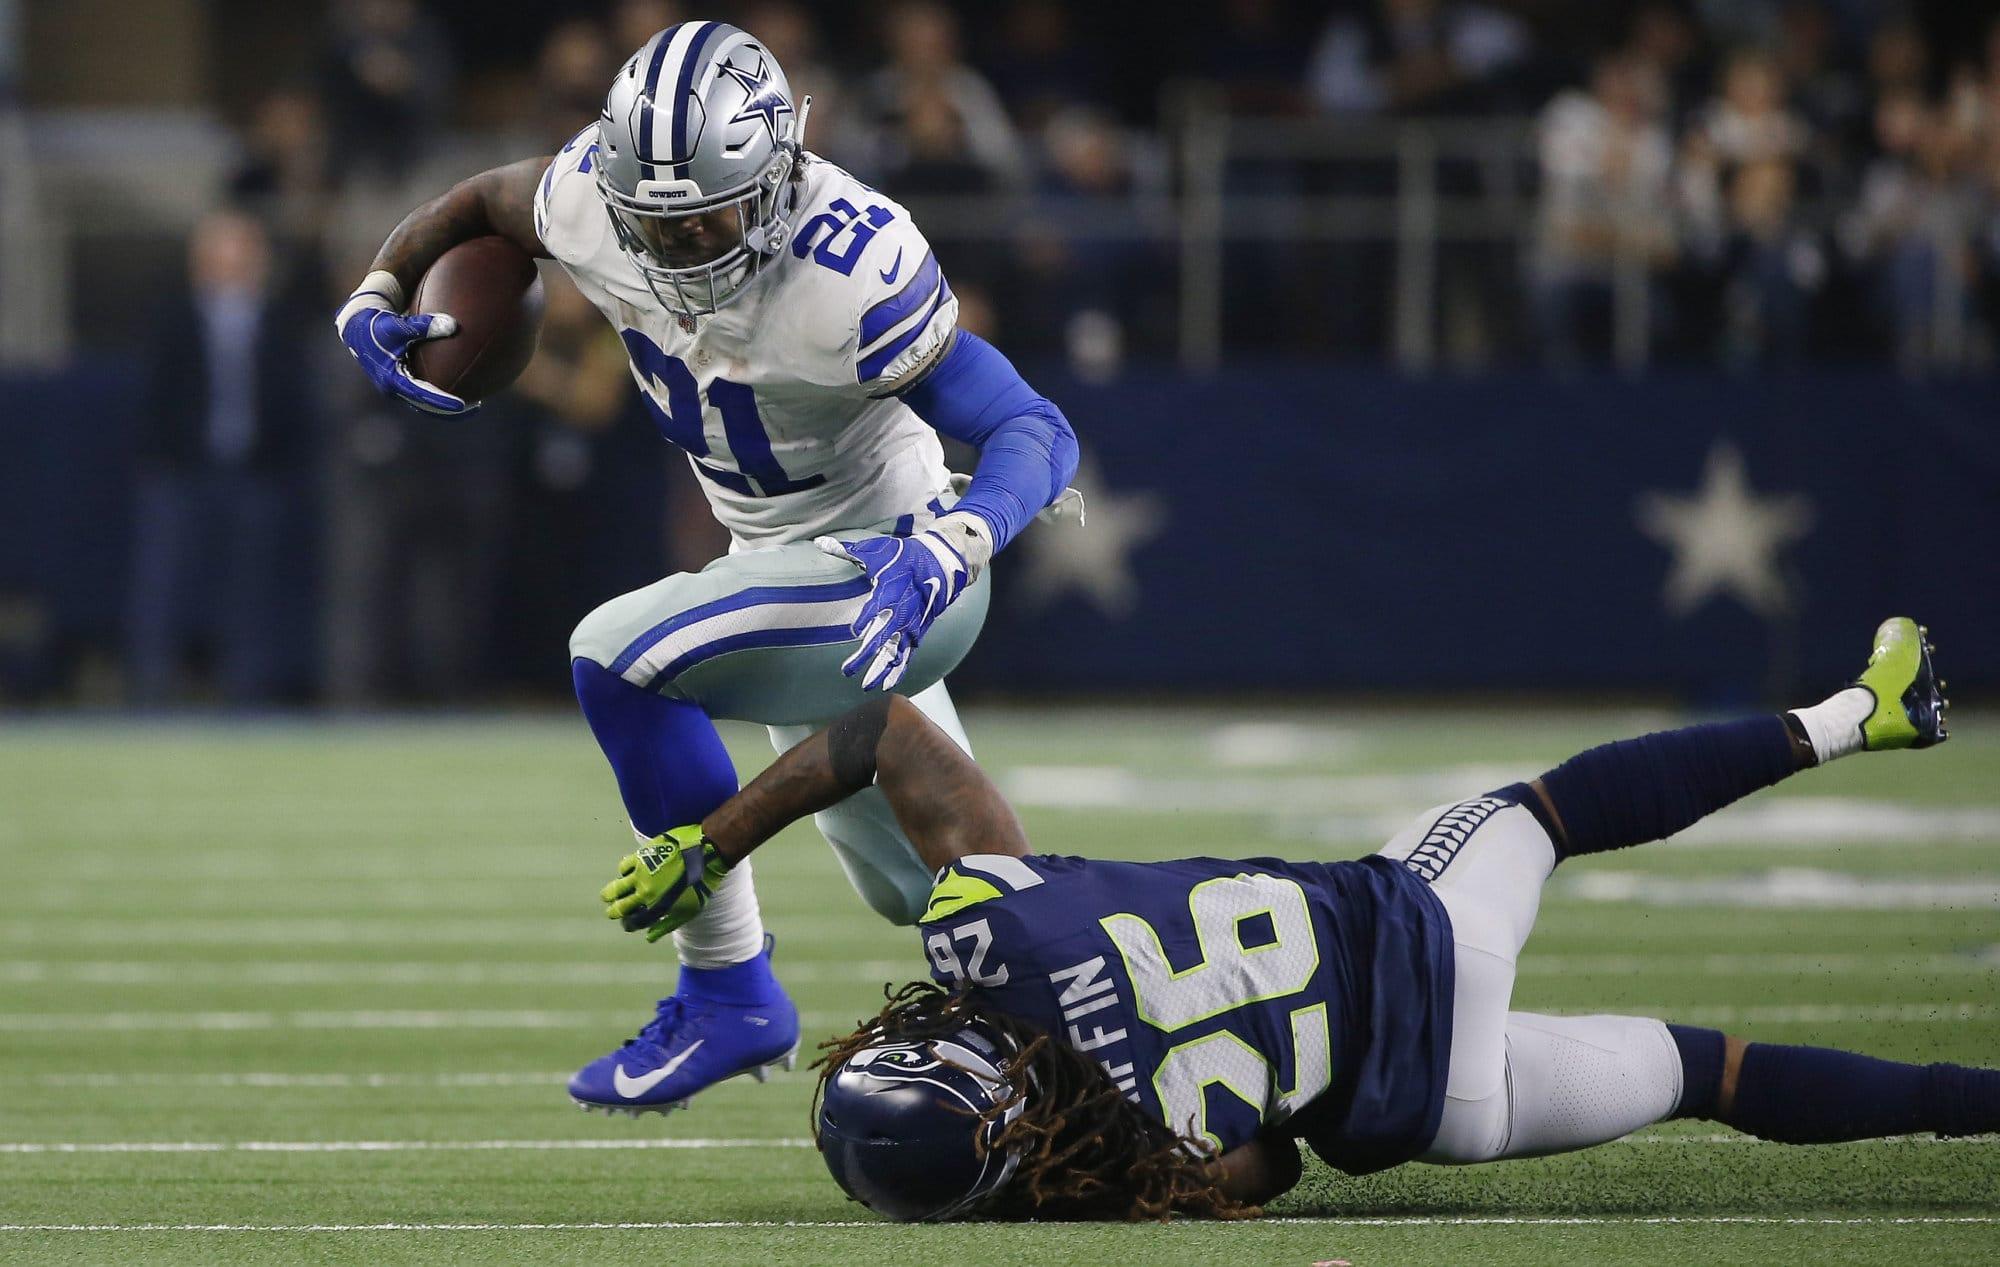 Dallas Cowboys running back Ezekiel Elliott (21) runs near Seattle Seahawks cornerback Shaquill Griffin (26) during the second half of the NFC wild-card NFL football game in Arlington, Texas, Saturday, Jan. 5, 2019. (AP Photo/Ron Jenkins)